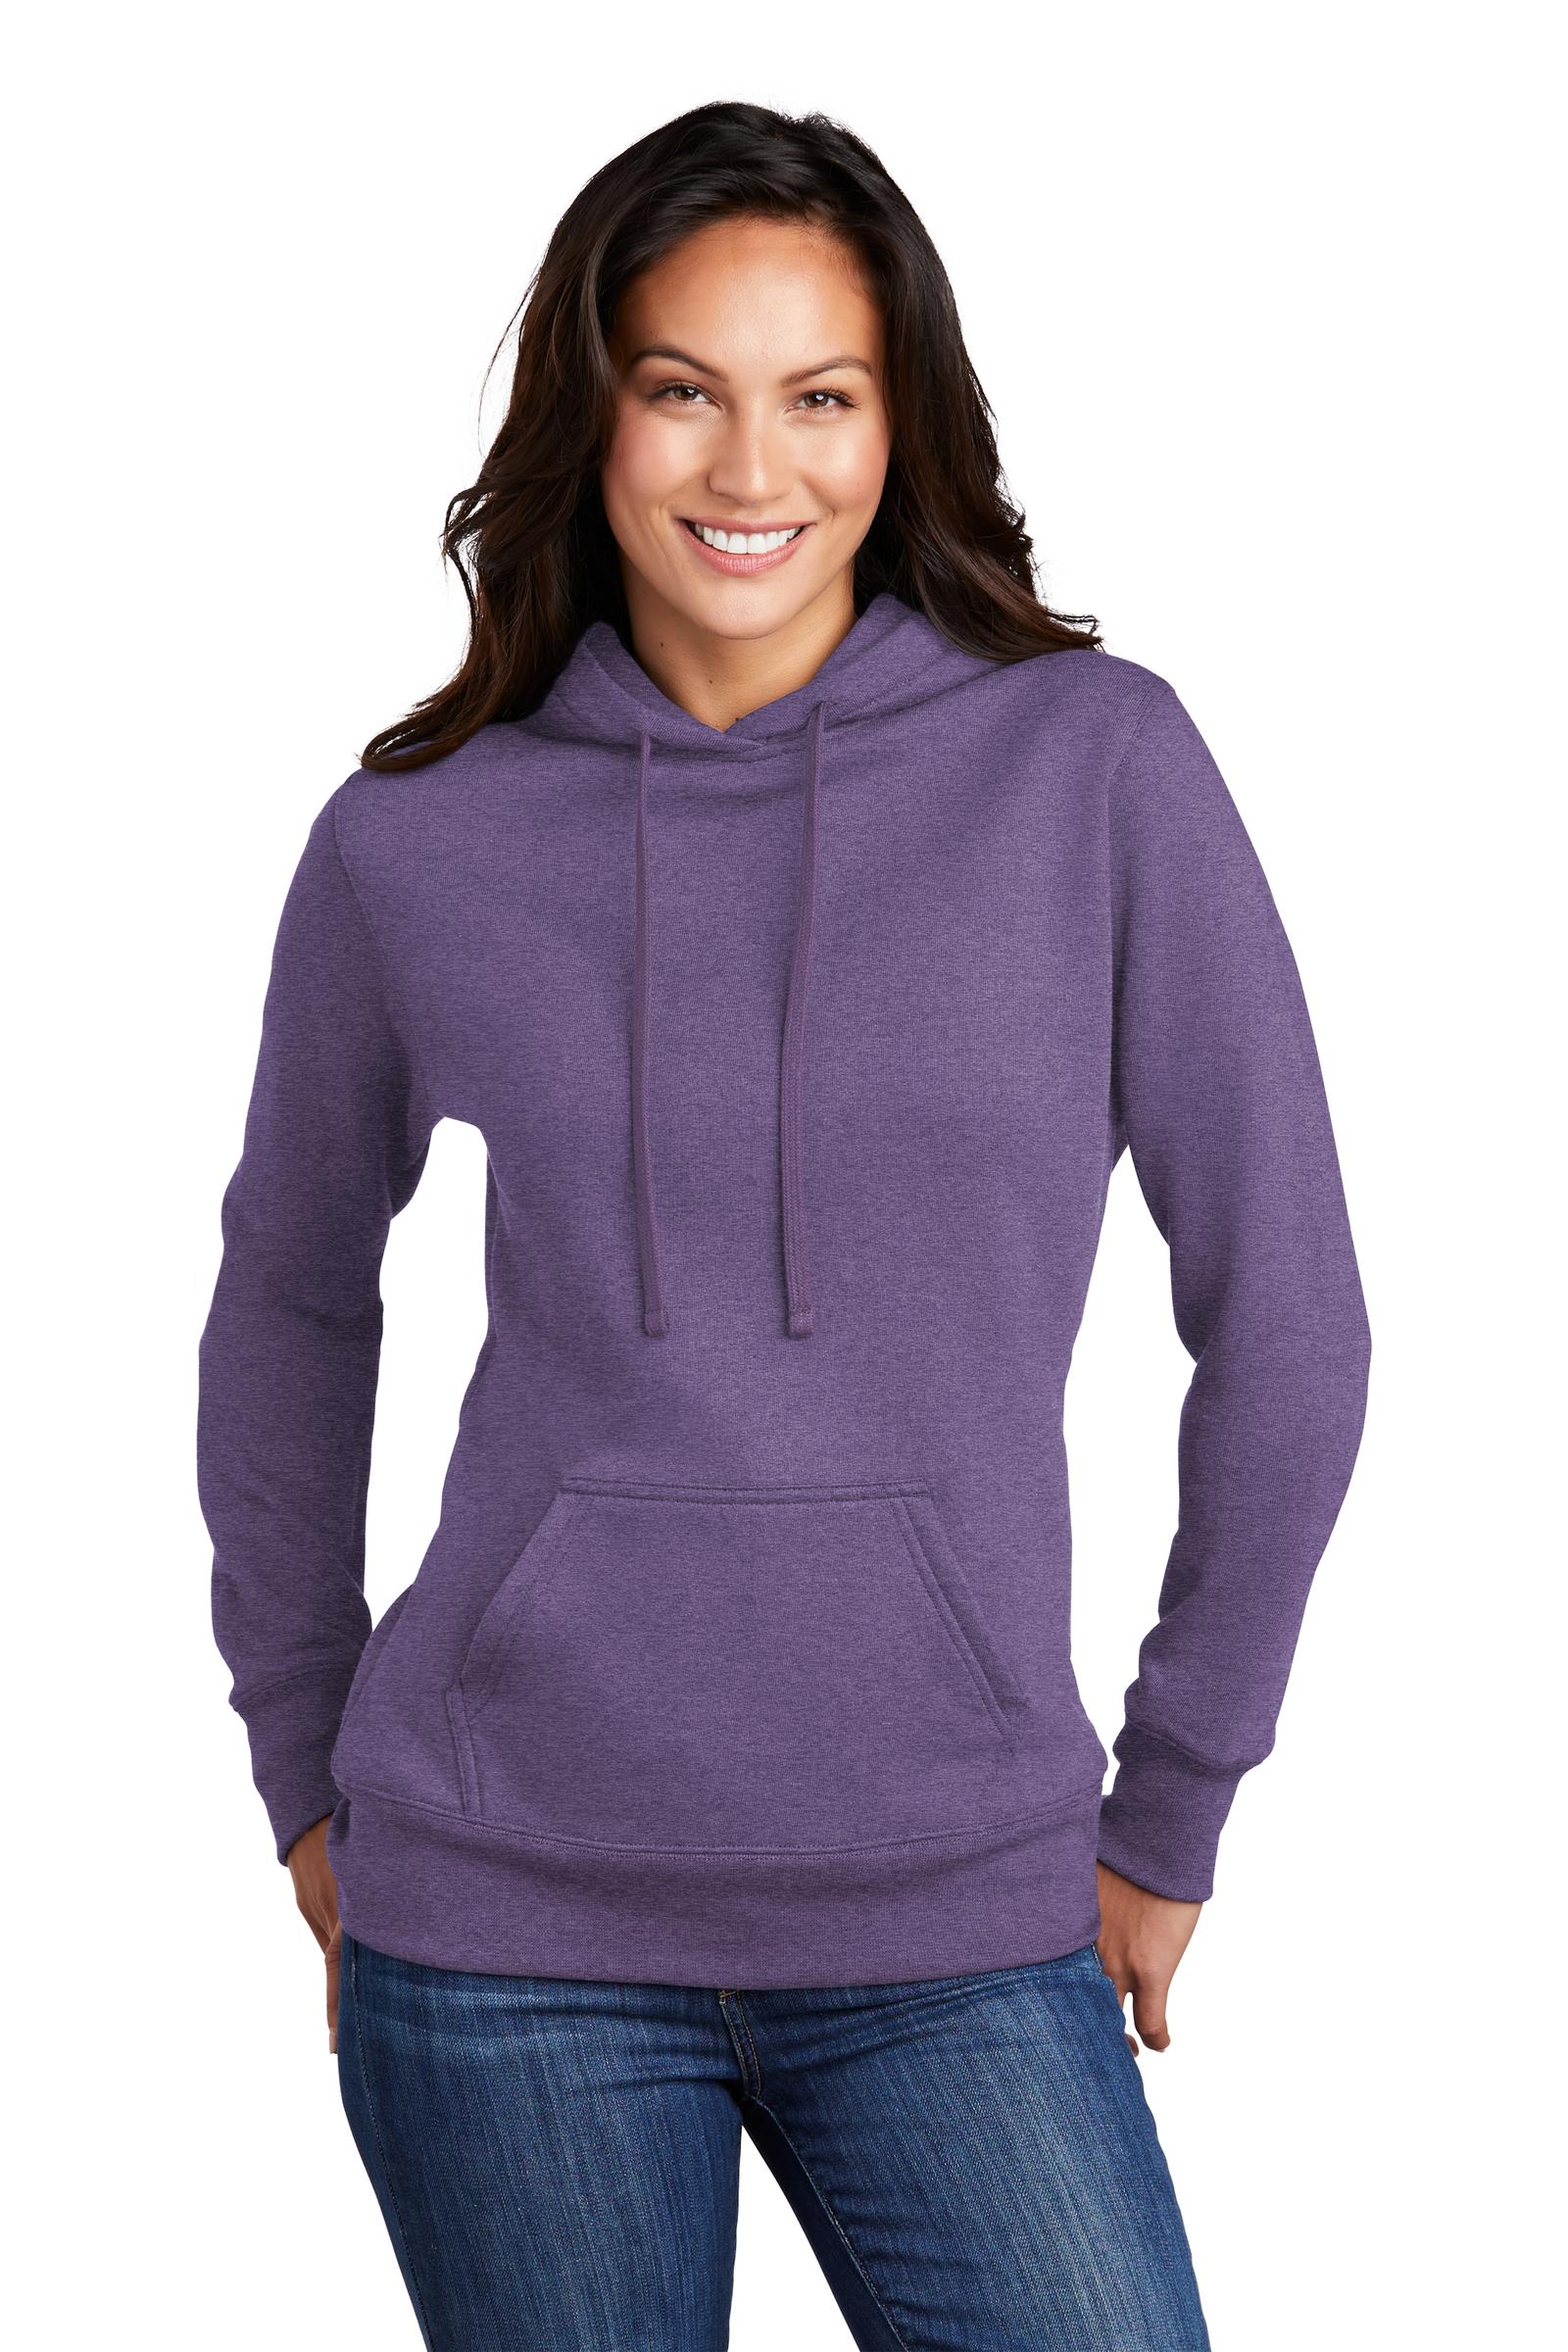 Port & Company Embroidered Women's Core Fleece Pullover Hooded Sweatshirt